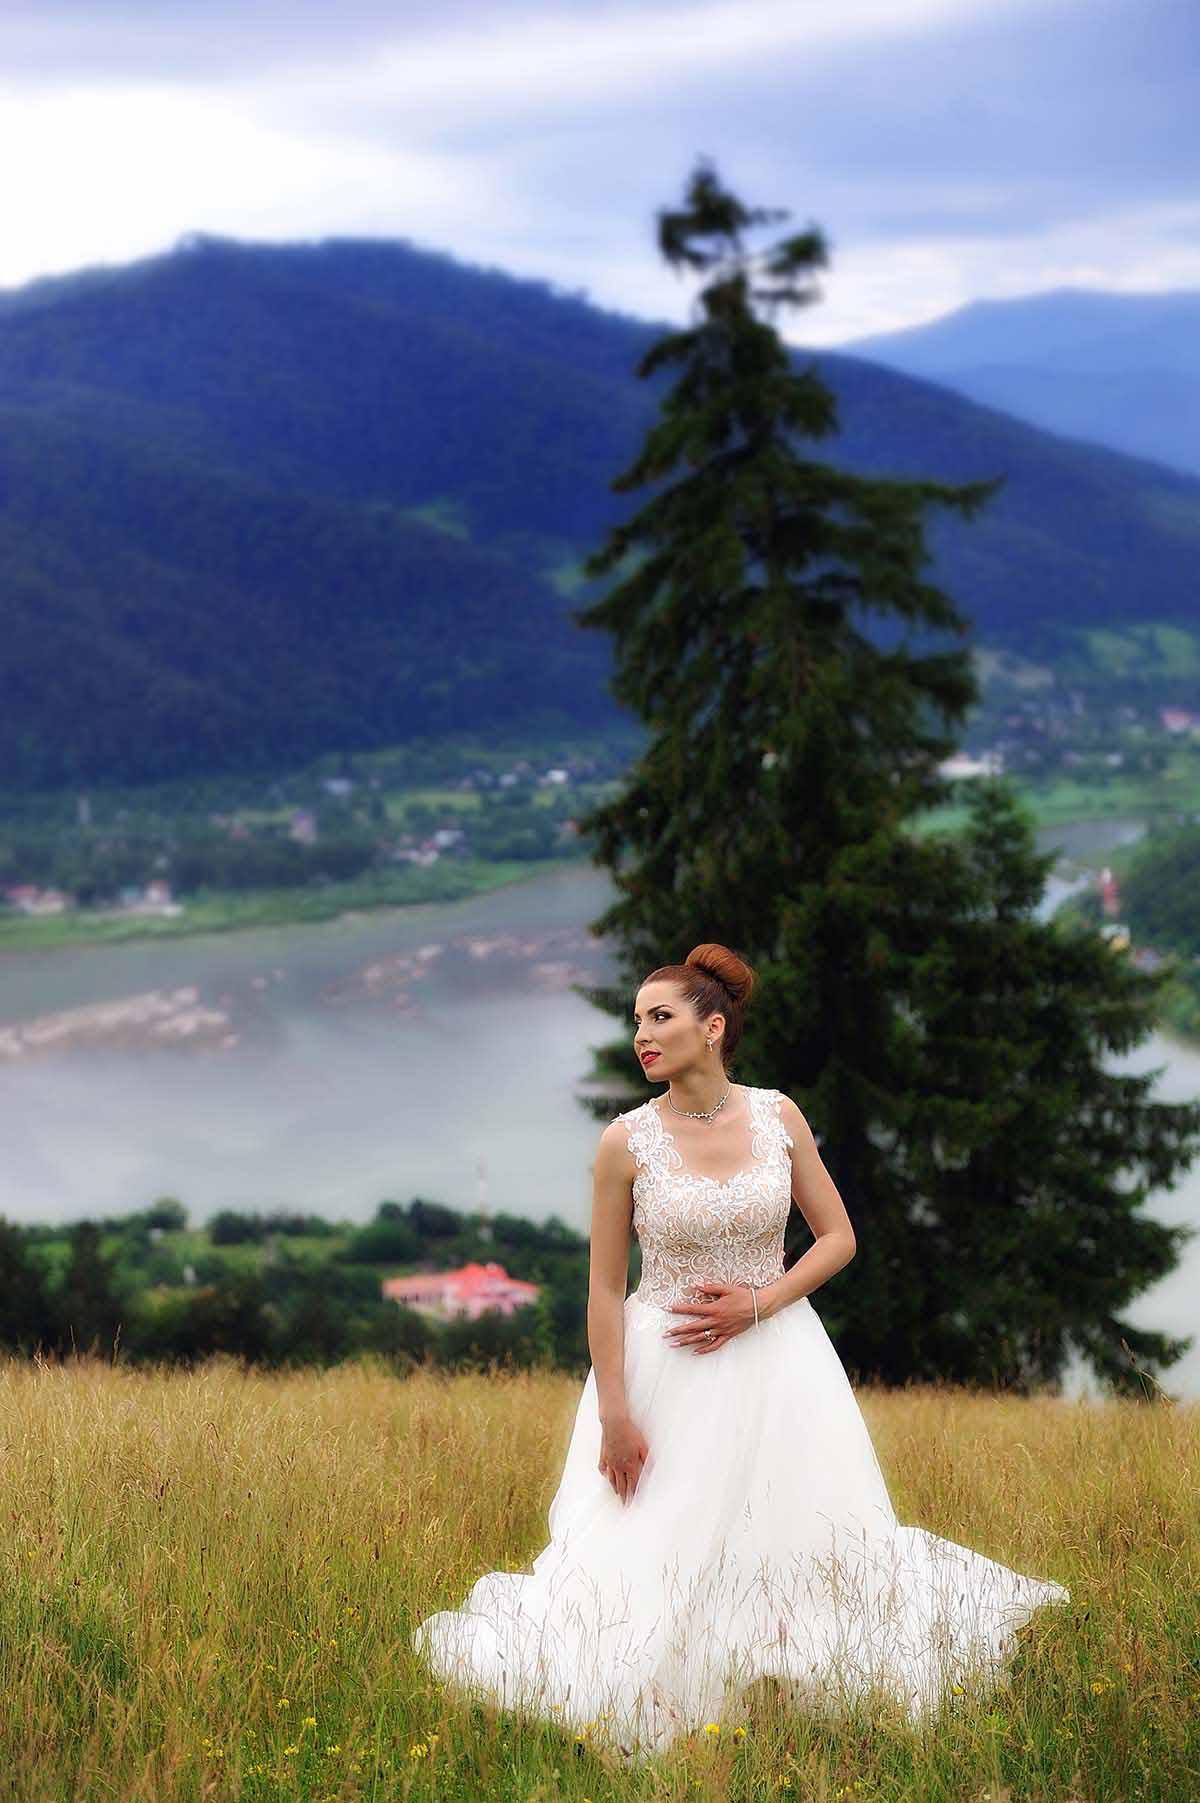 Sedinta foto dupa nunta, sedinta foto glamour after wed la Bisericani